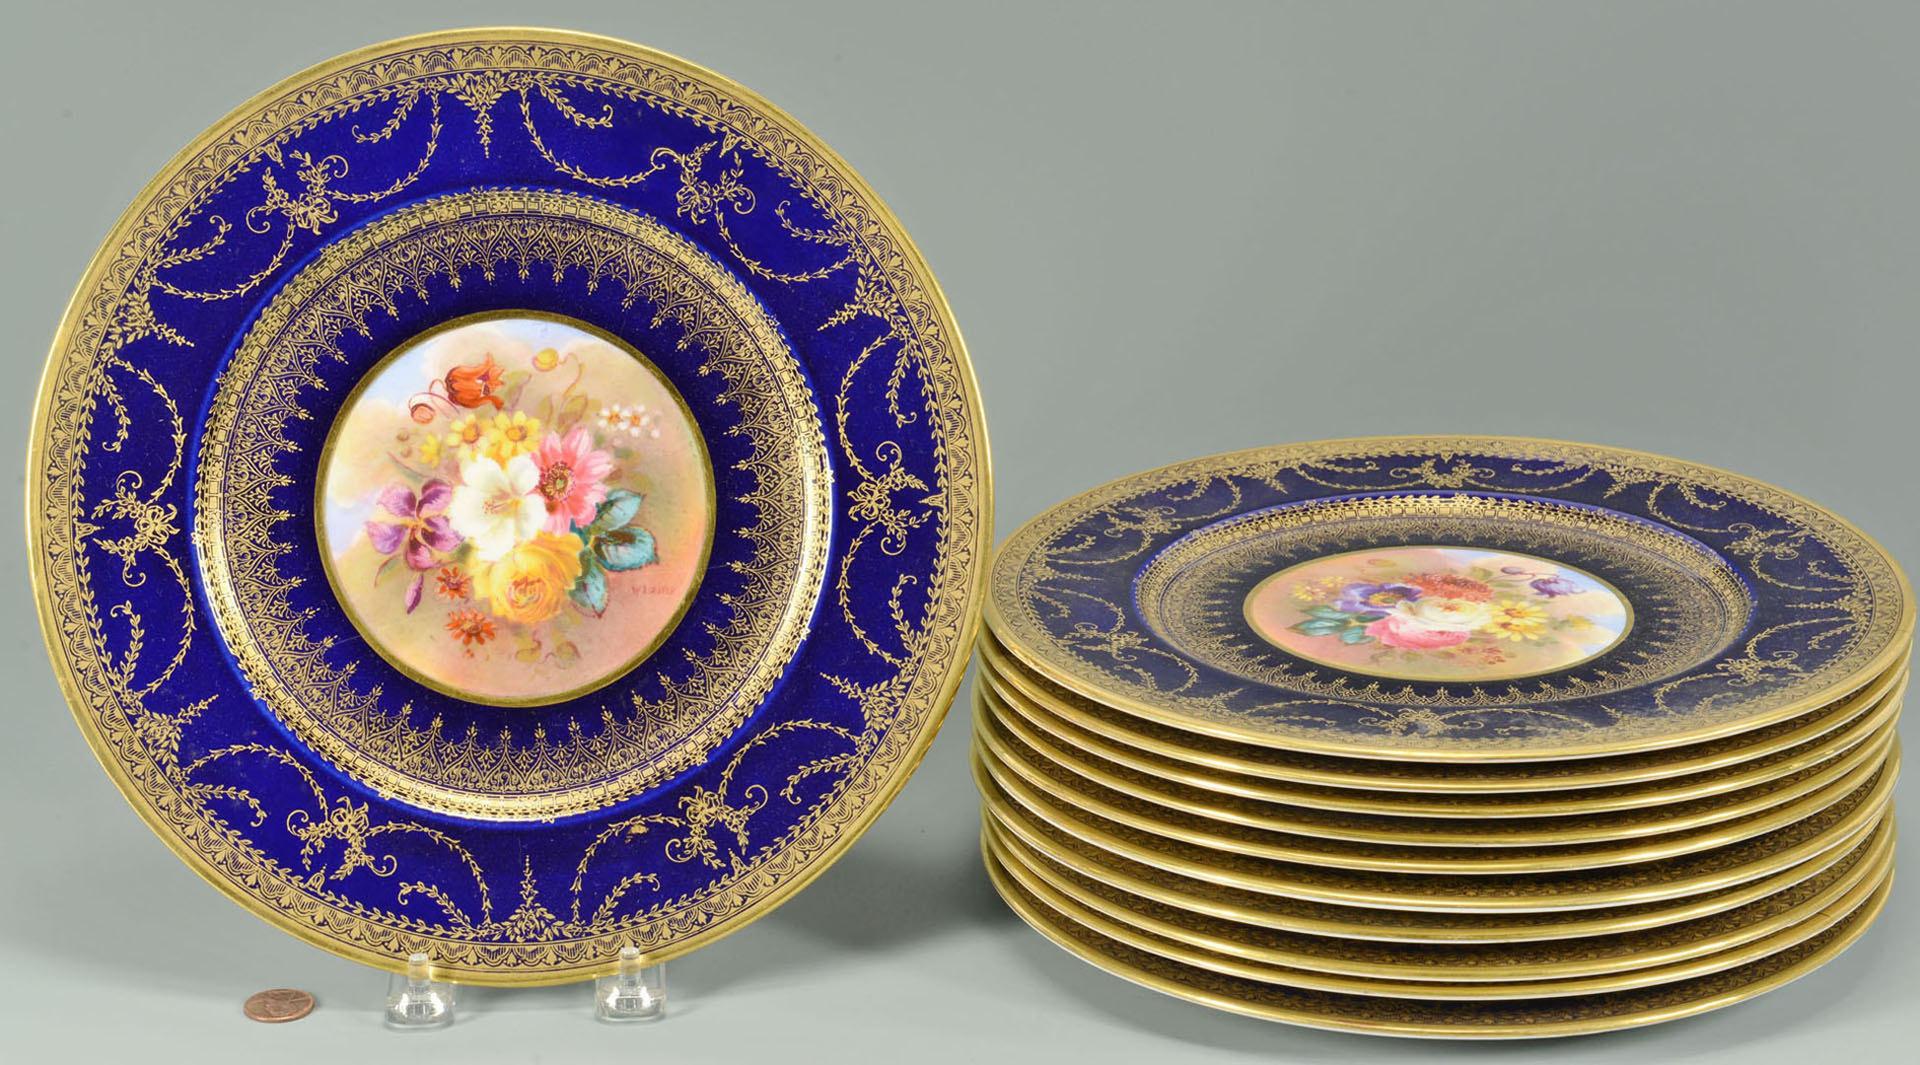 Lot 569: 12 George Jones Crescent & Sons Service Plates, co